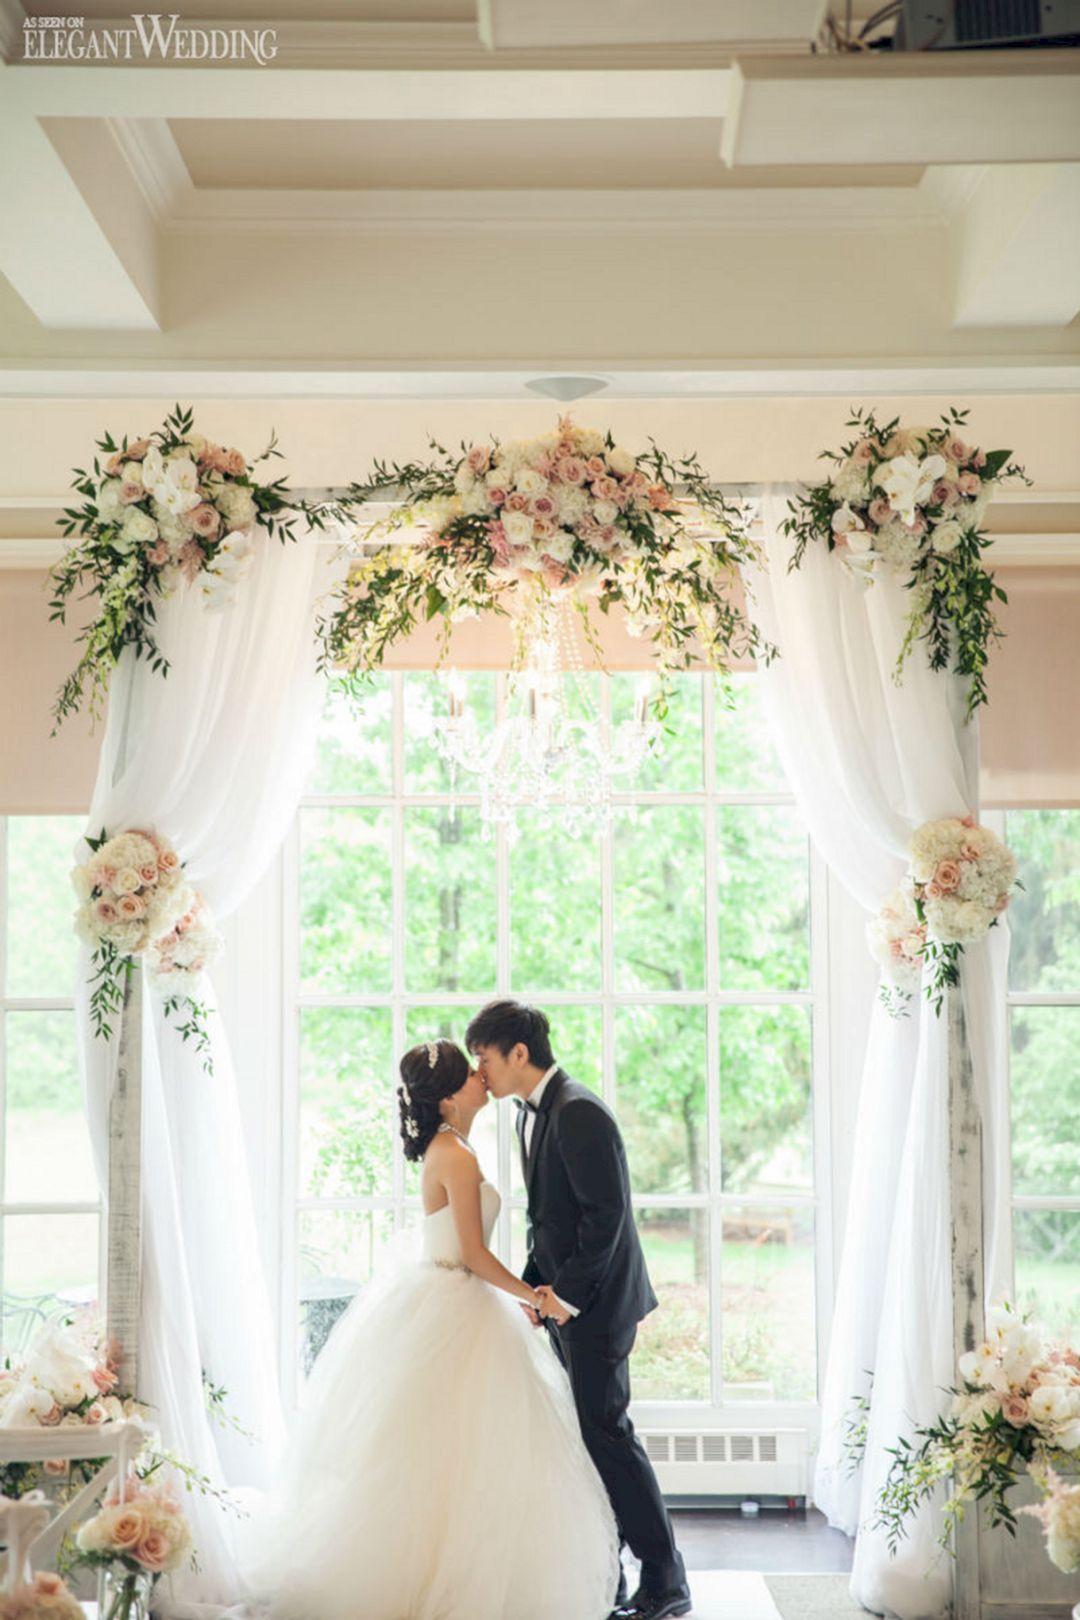 40+ Beautiful White Indoor Wedding Ceremony Ideas You Need